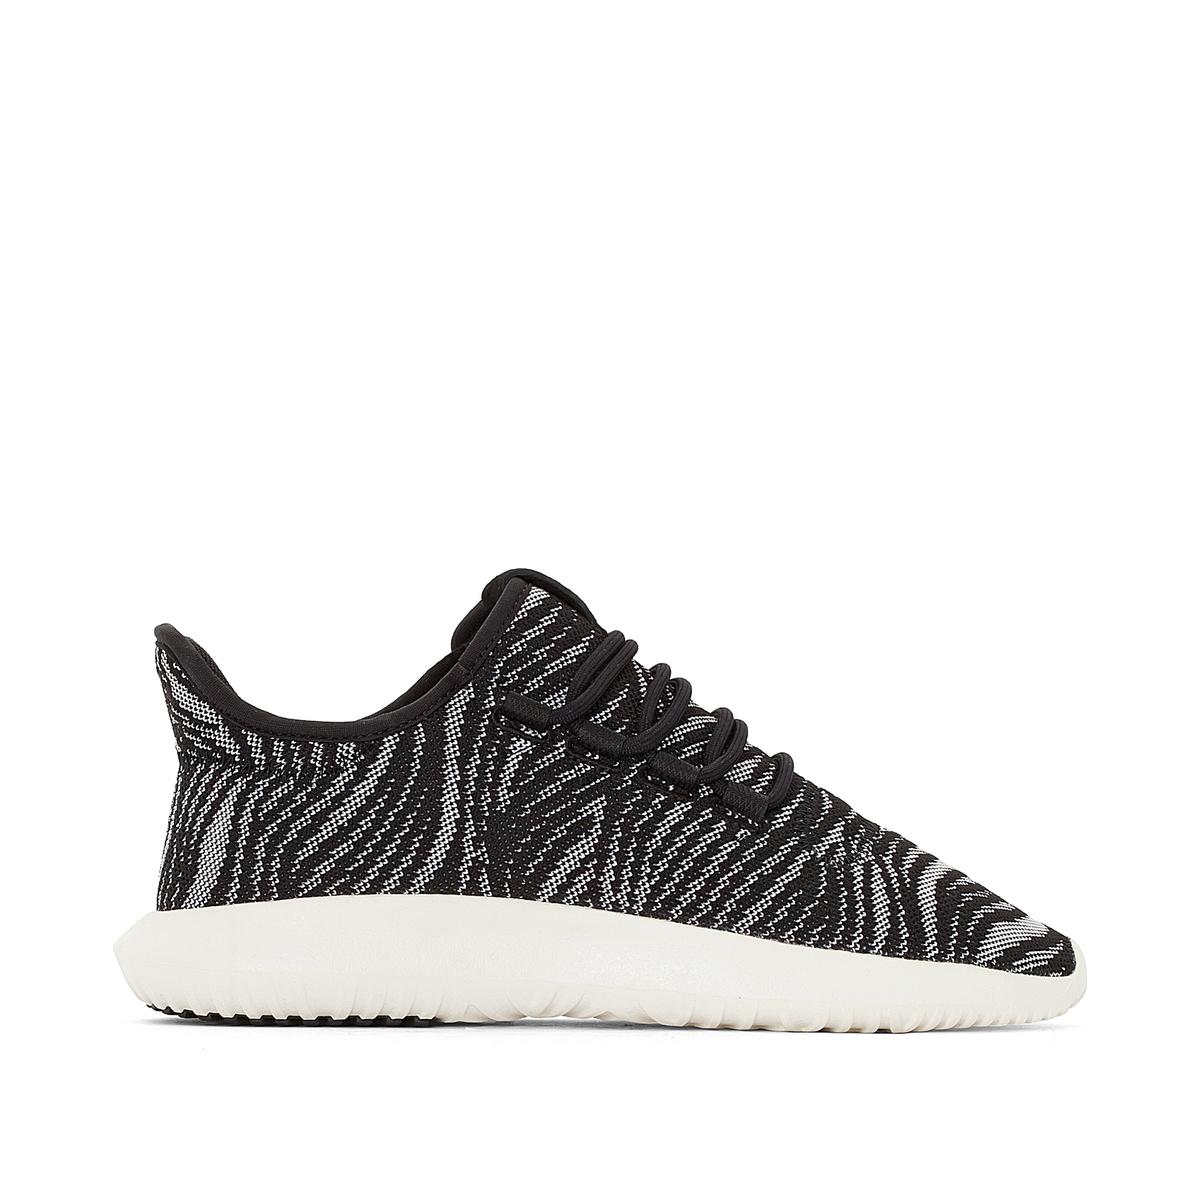 Lage Sneakers adidas Tubular Shadow Schoenen Vindjeschoen.nl